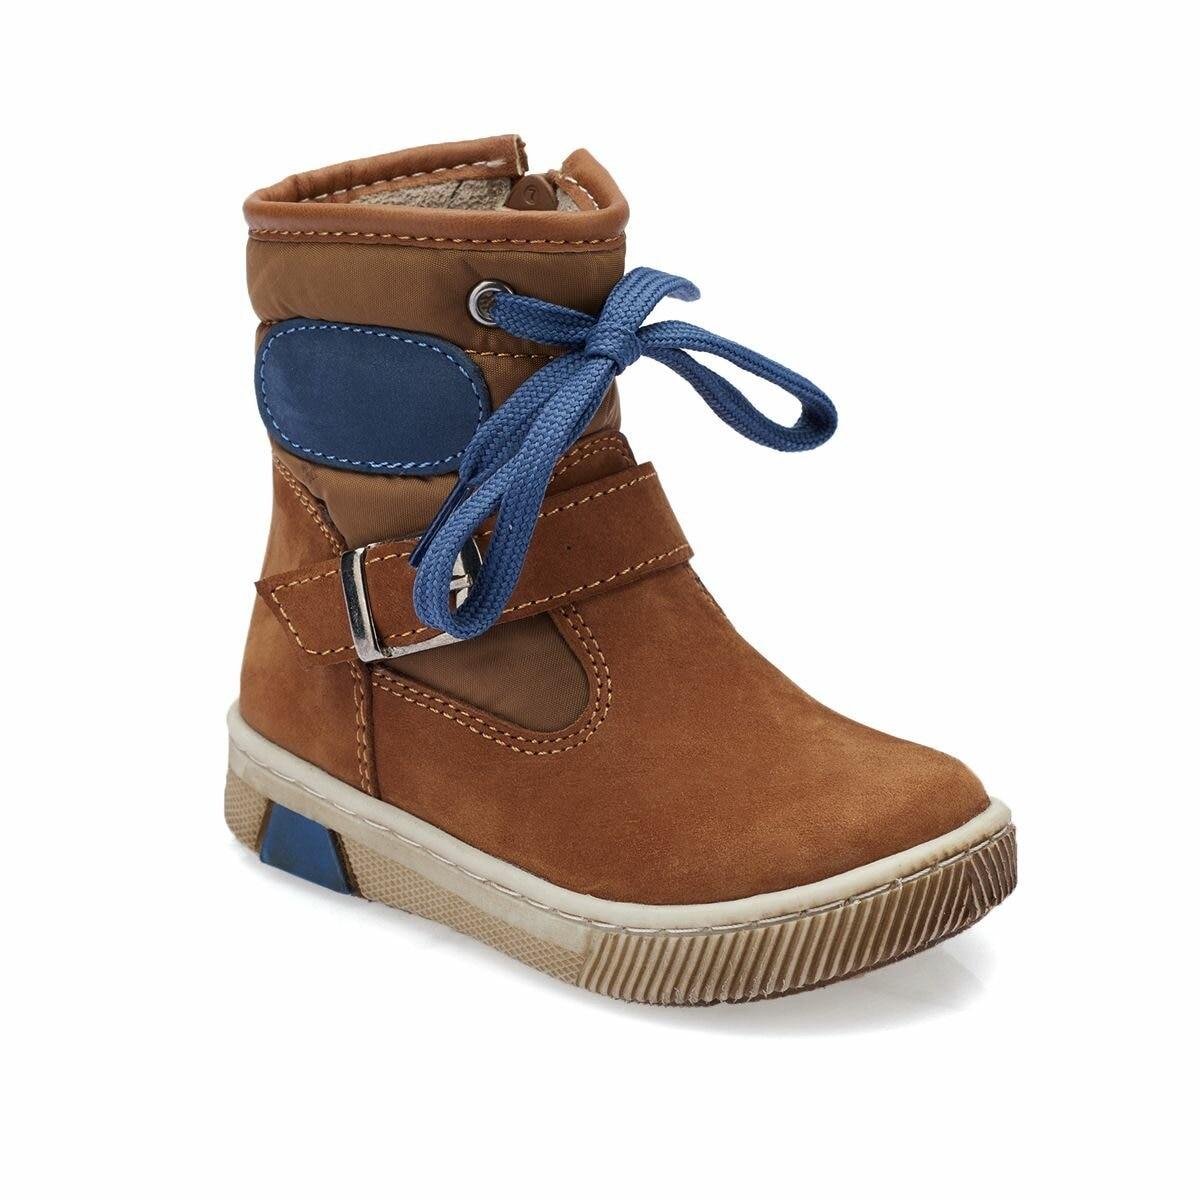 FLO 82.510729.B أحذية أطفال قرفة بولاريس